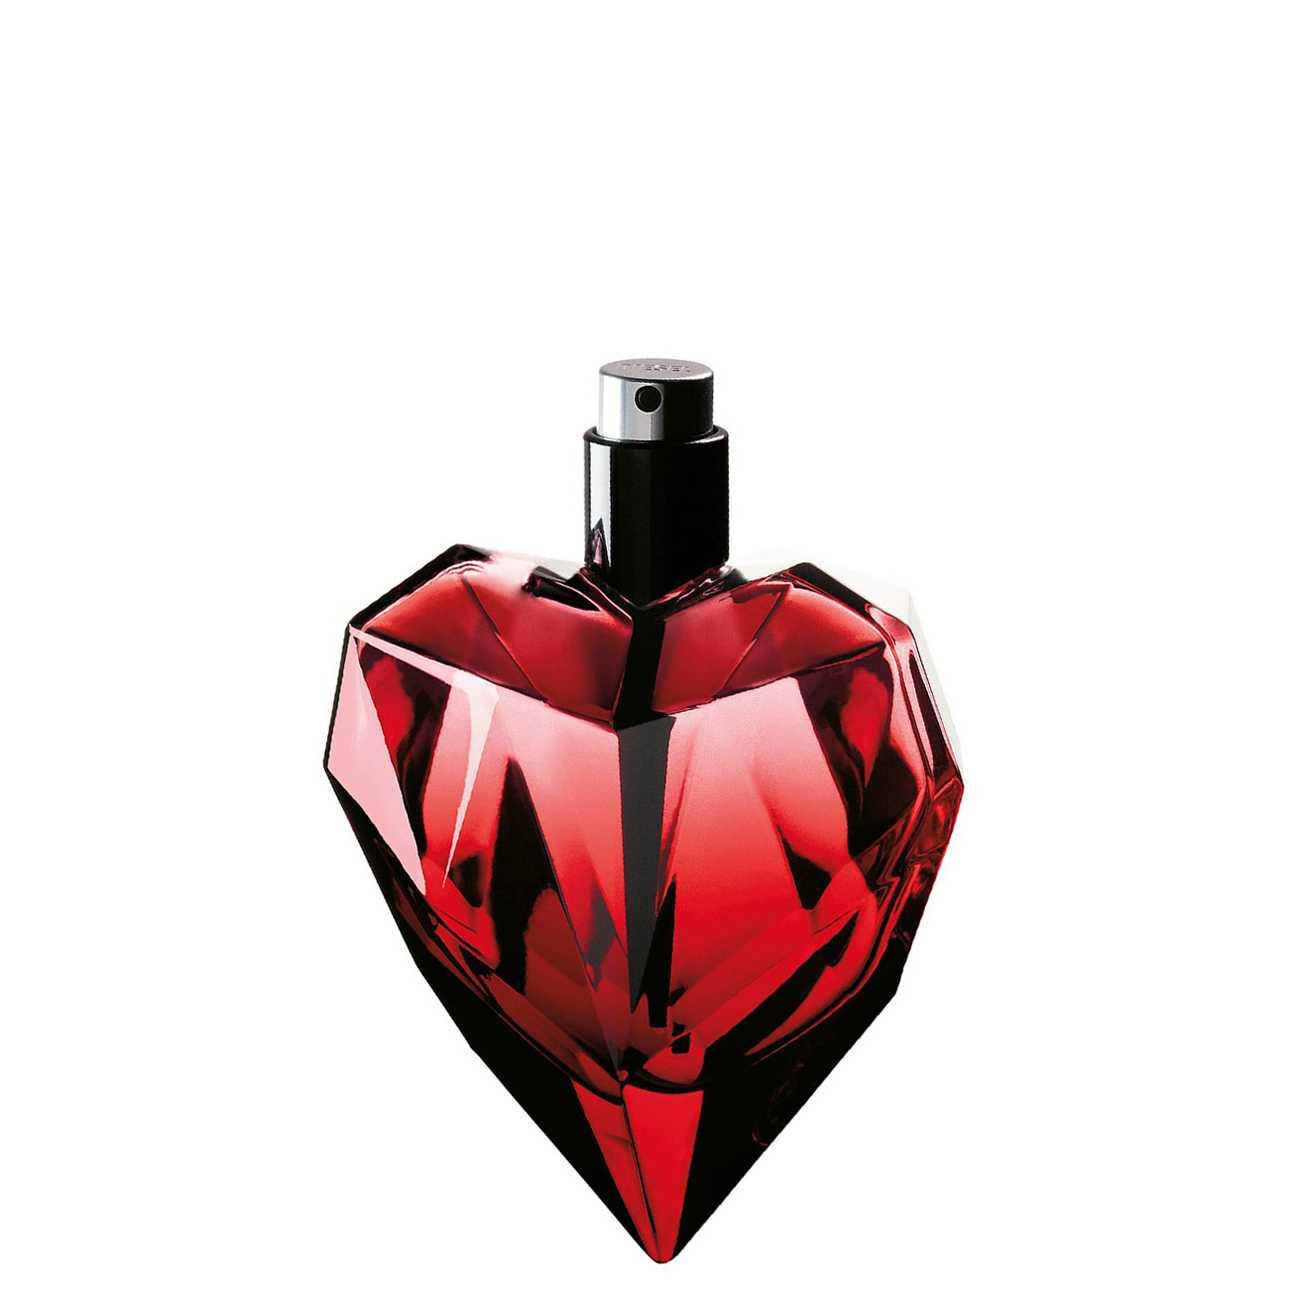 LOVERDOSE RED KISS 50 ML 50ml